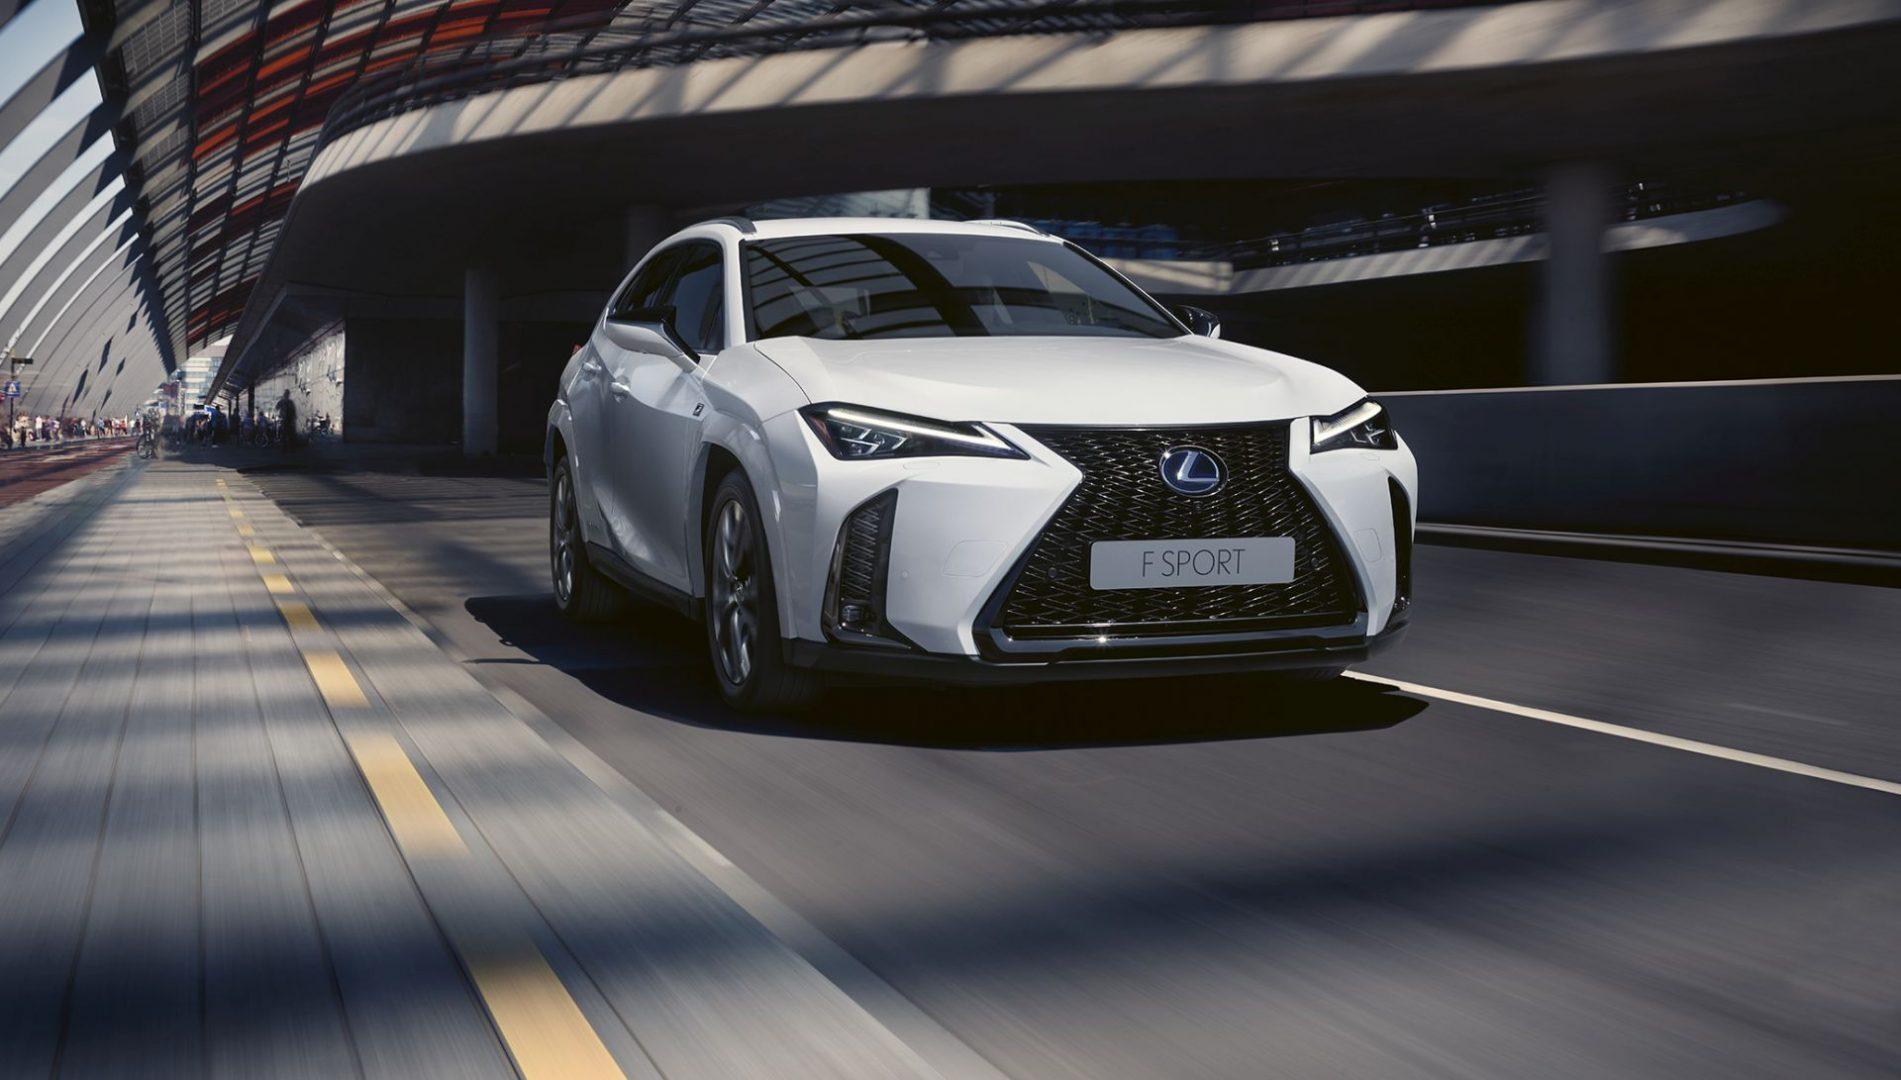 Lexus nudi Relax program s do 10 godina jamstva na vozila